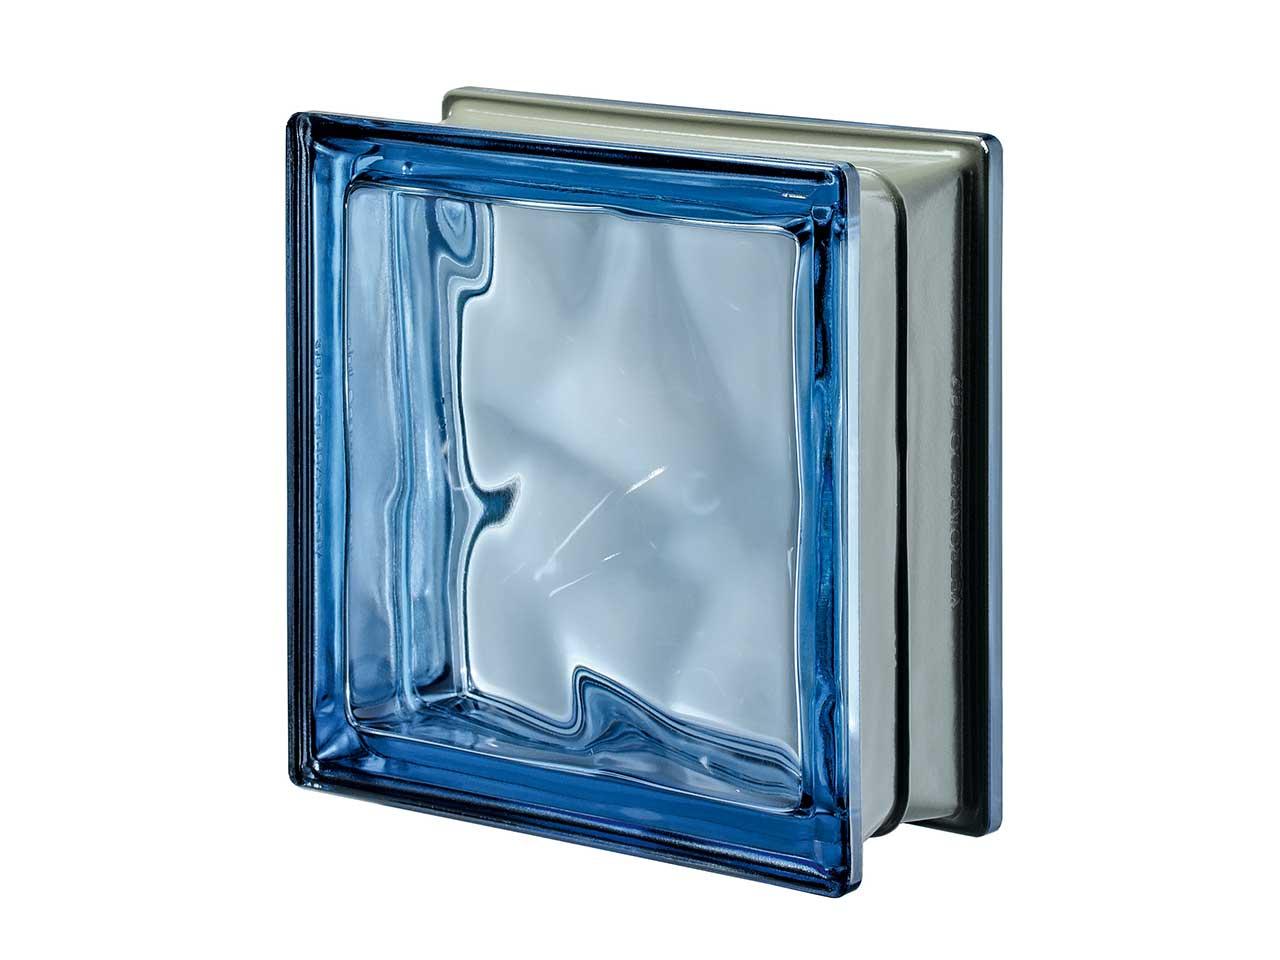 Vetromat blu q19 o met 19x19x8 iperceramica - Finestra vetrocemento ...